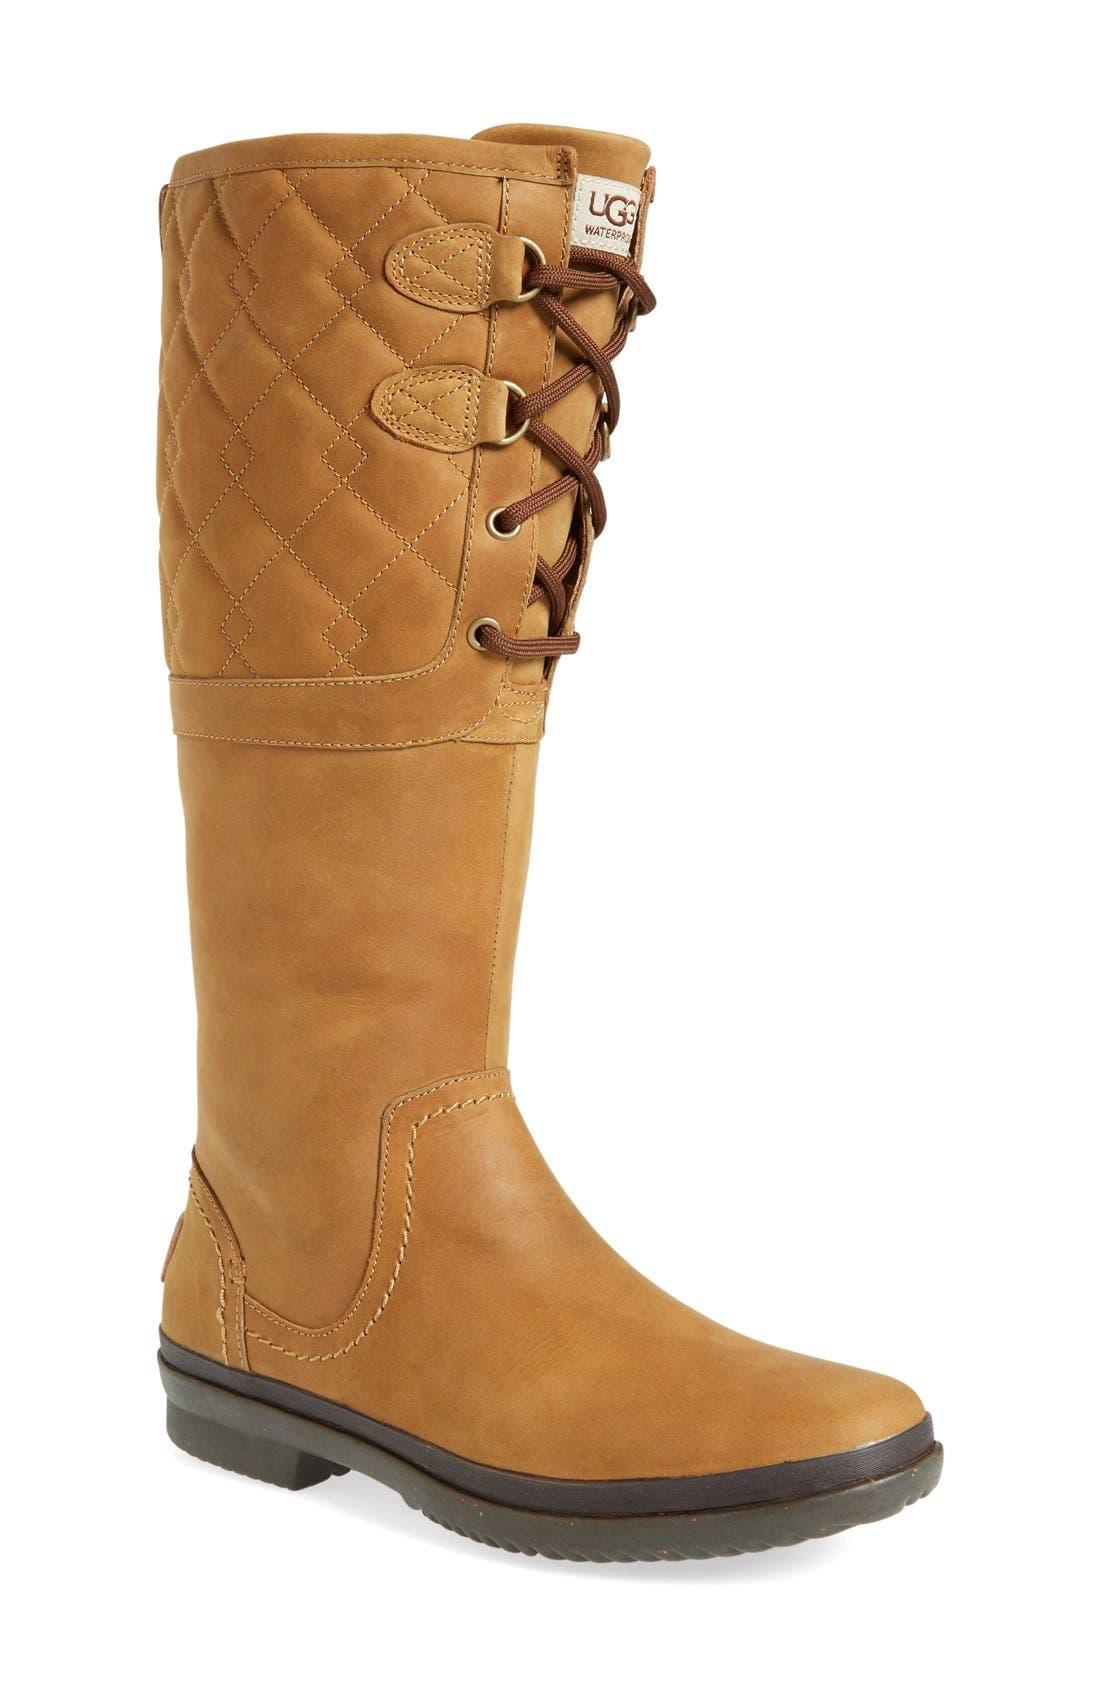 Alternate Image 1 Selected - UGG® Elsa Quilted Waterproof Boot (Women)